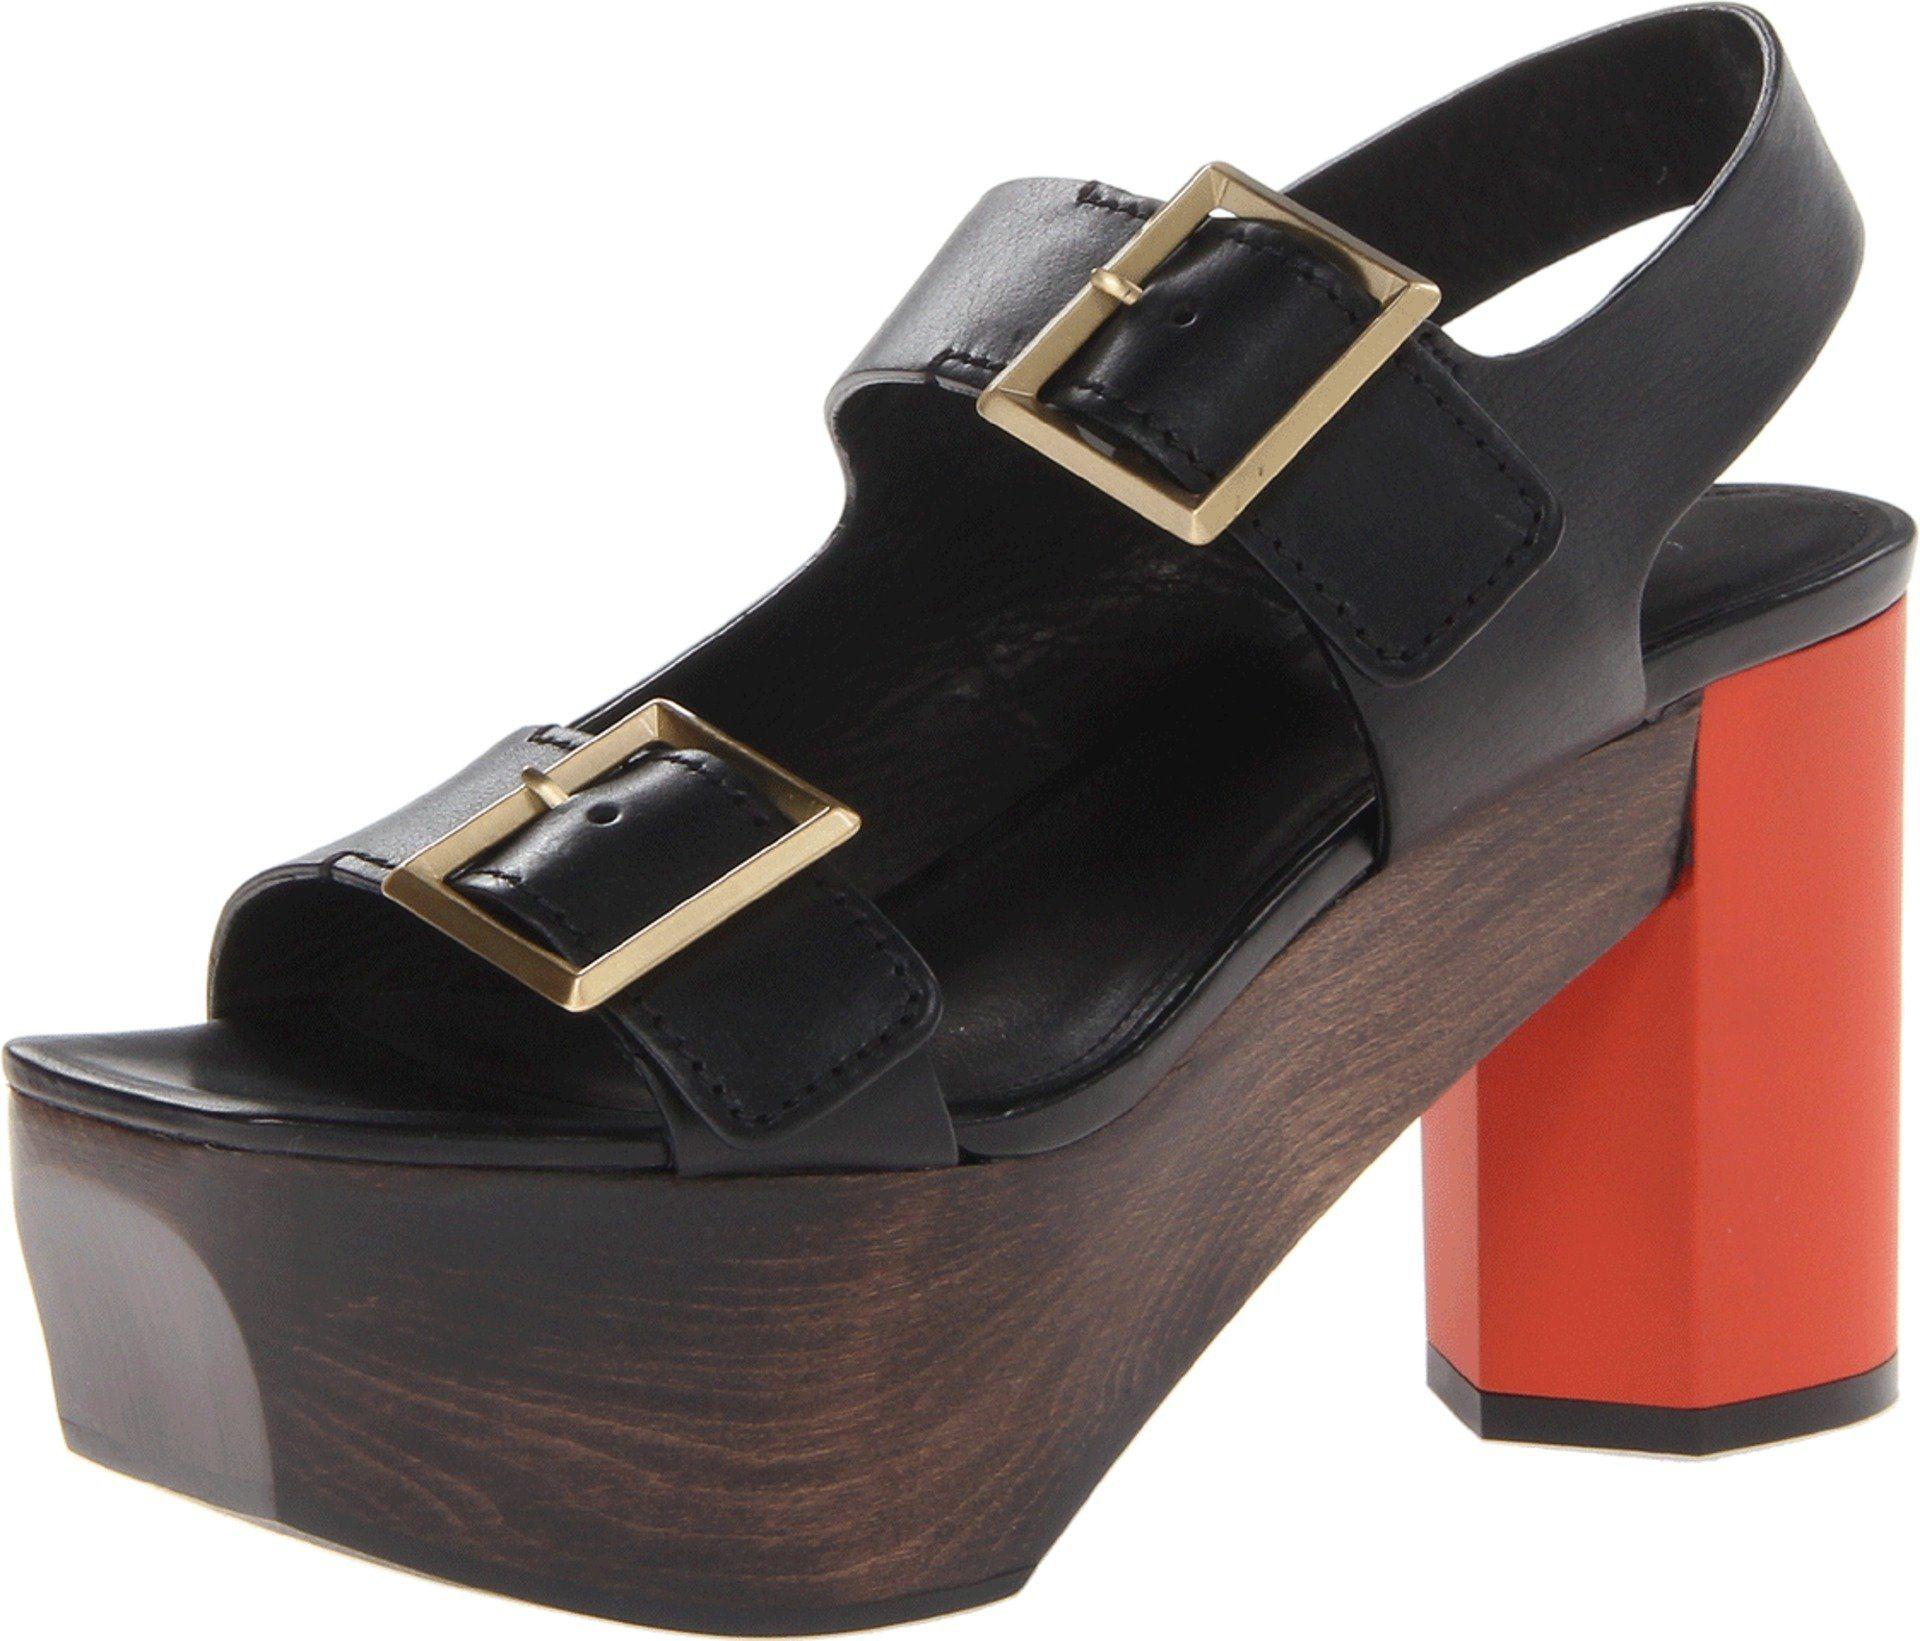 Calvin Klein Collection Women's Ellen Dress Sandal,Black,38 EU/7.5 M US